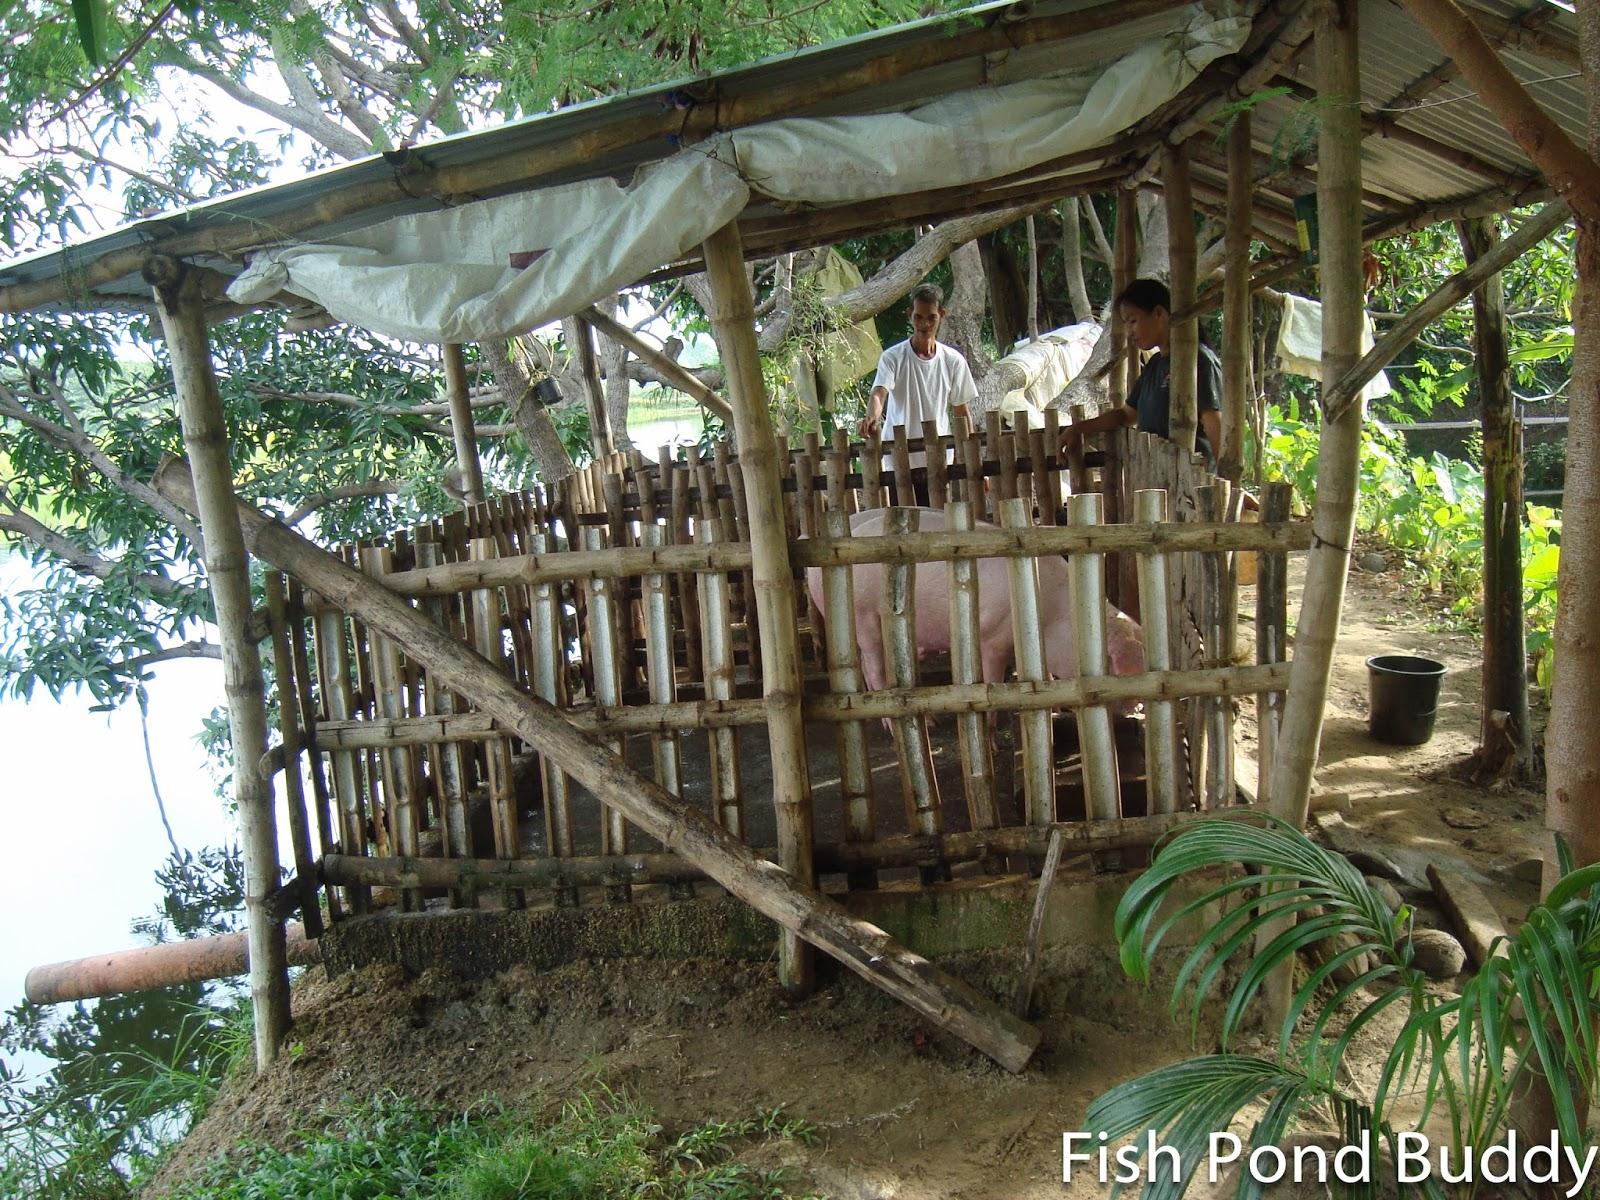 fish pond buddy growing livestock at the fish farm